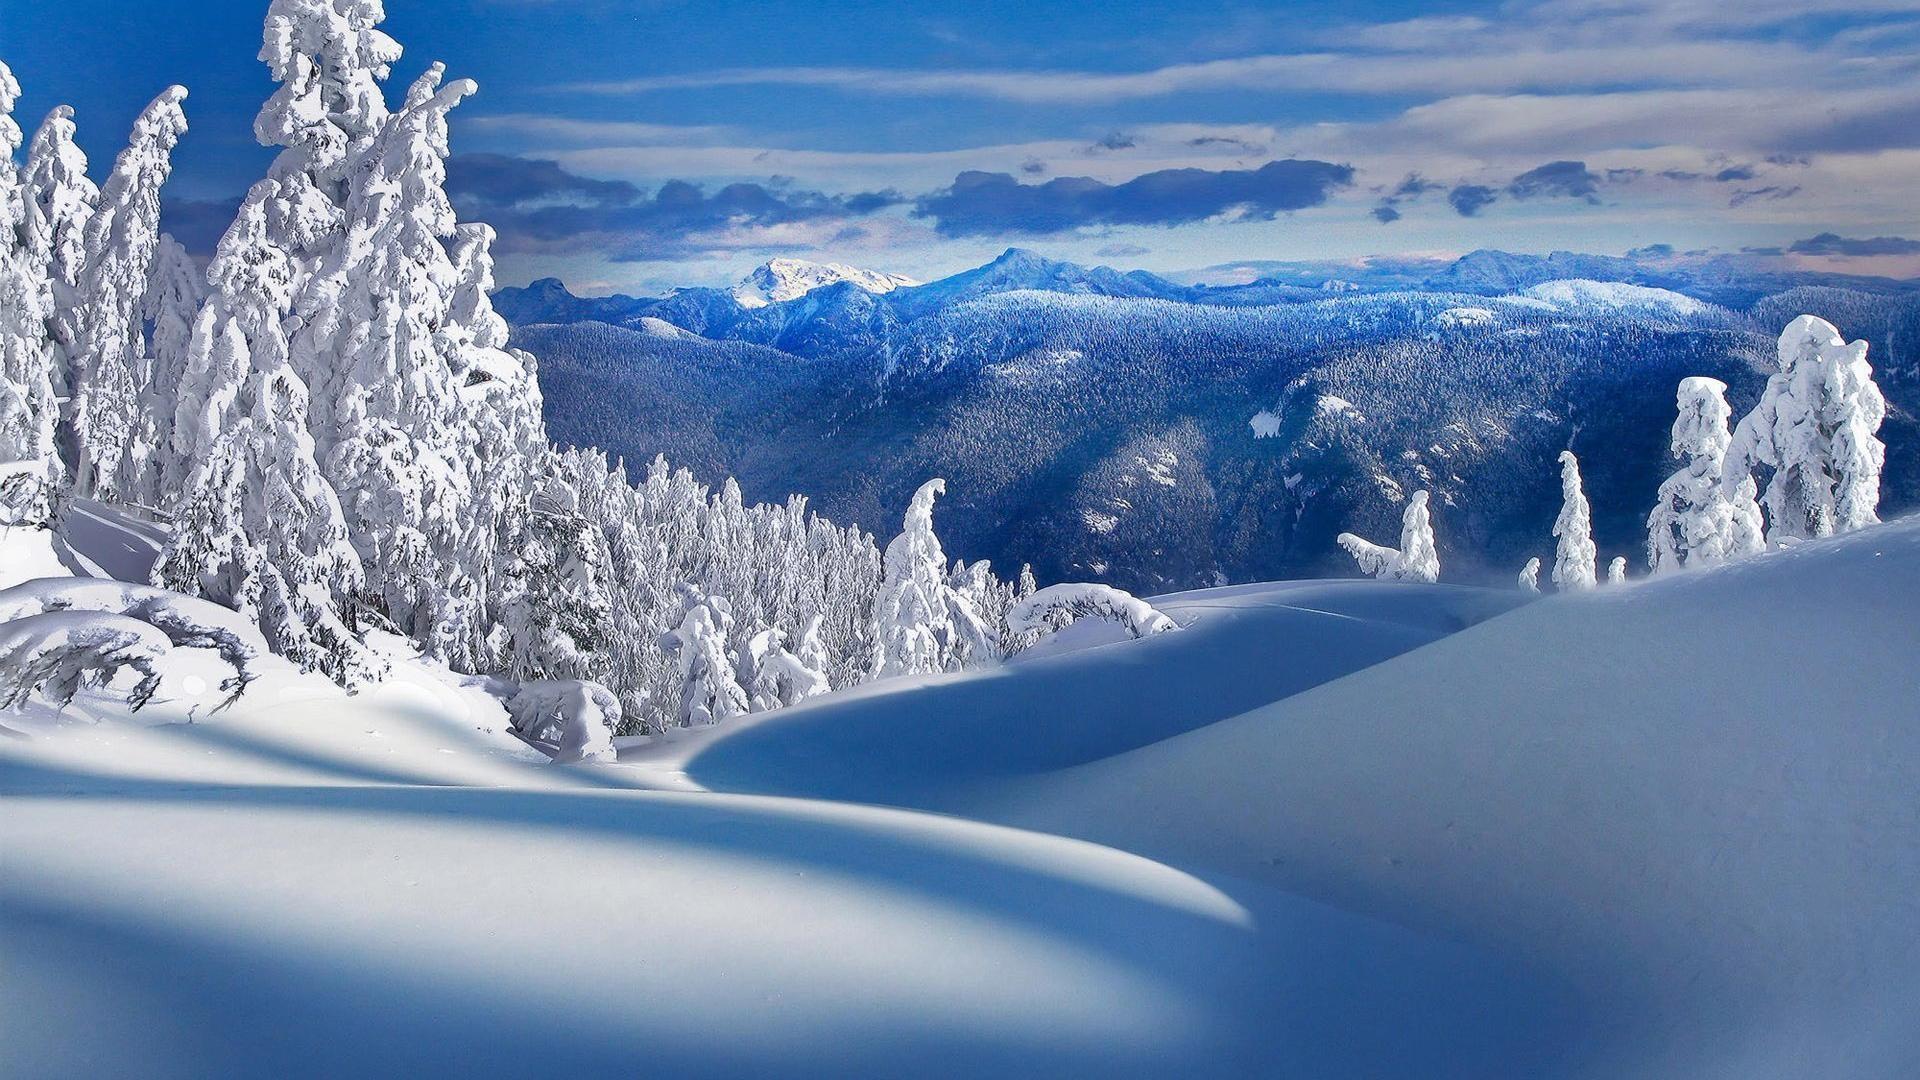 Snow HD Wallpaper – Wallpaper, High Definition, High Quality .